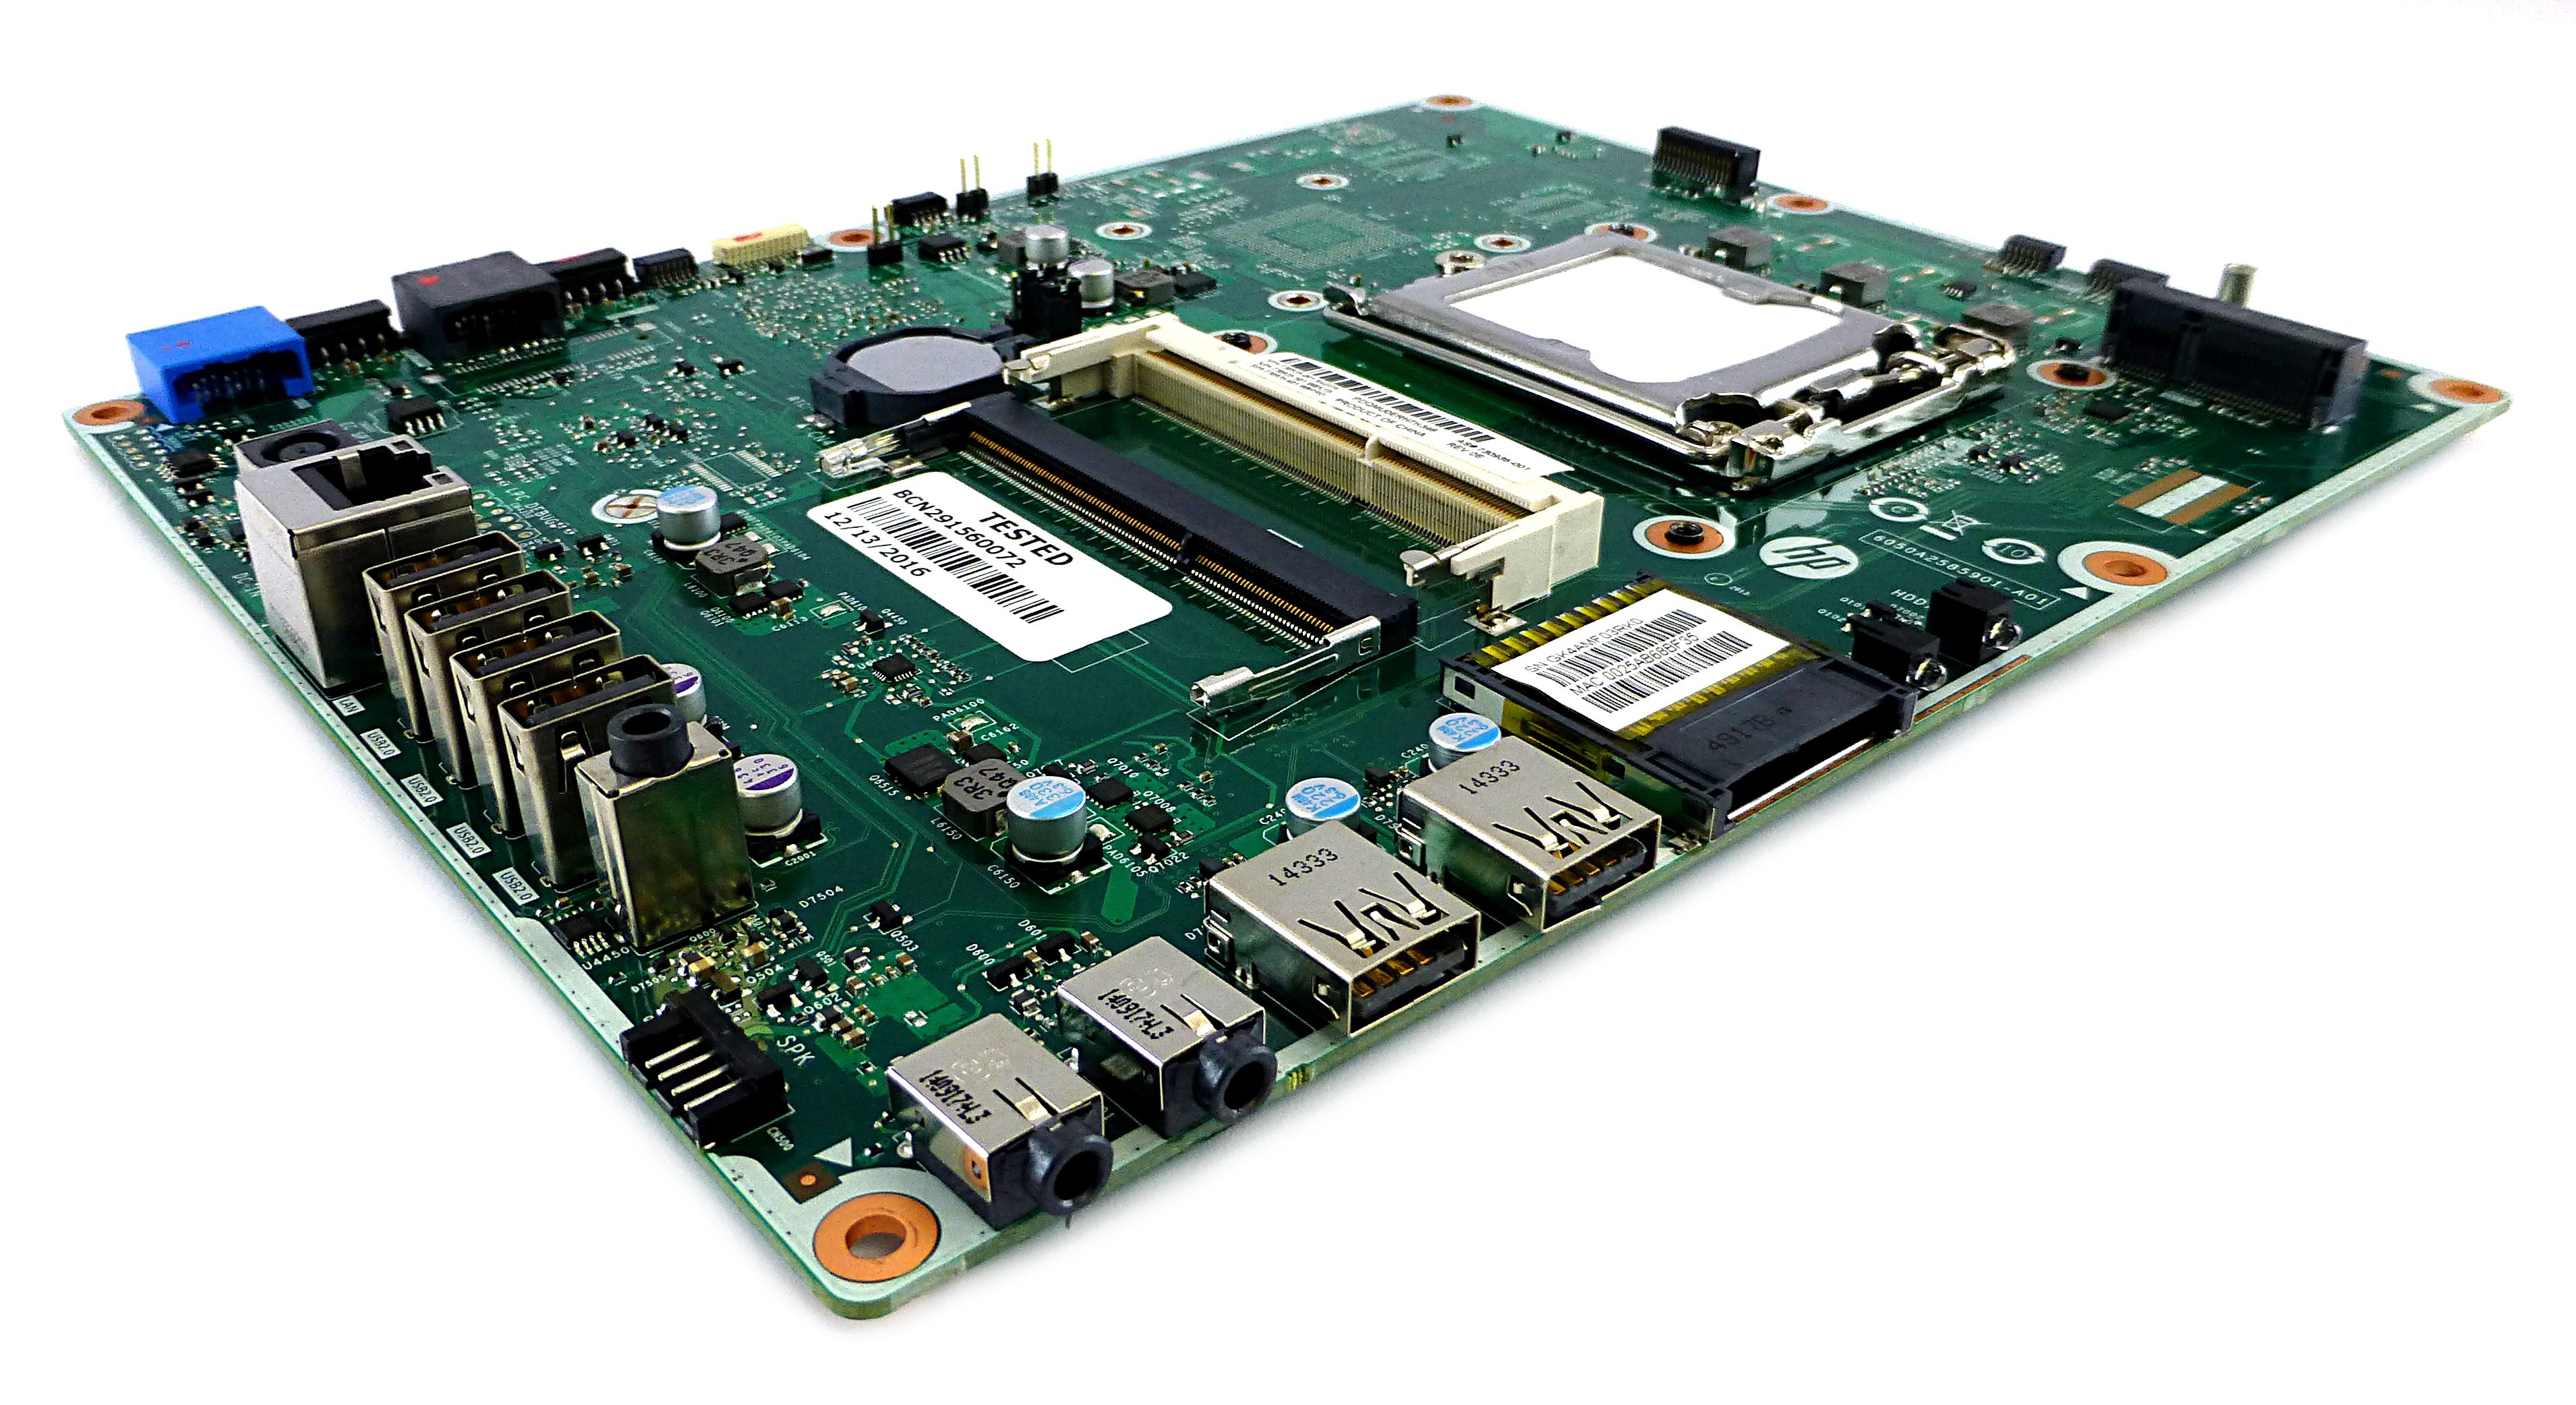 HP AiO 23-p030na Motherboard 730935-001 Socket LGA1150 (Haswell)